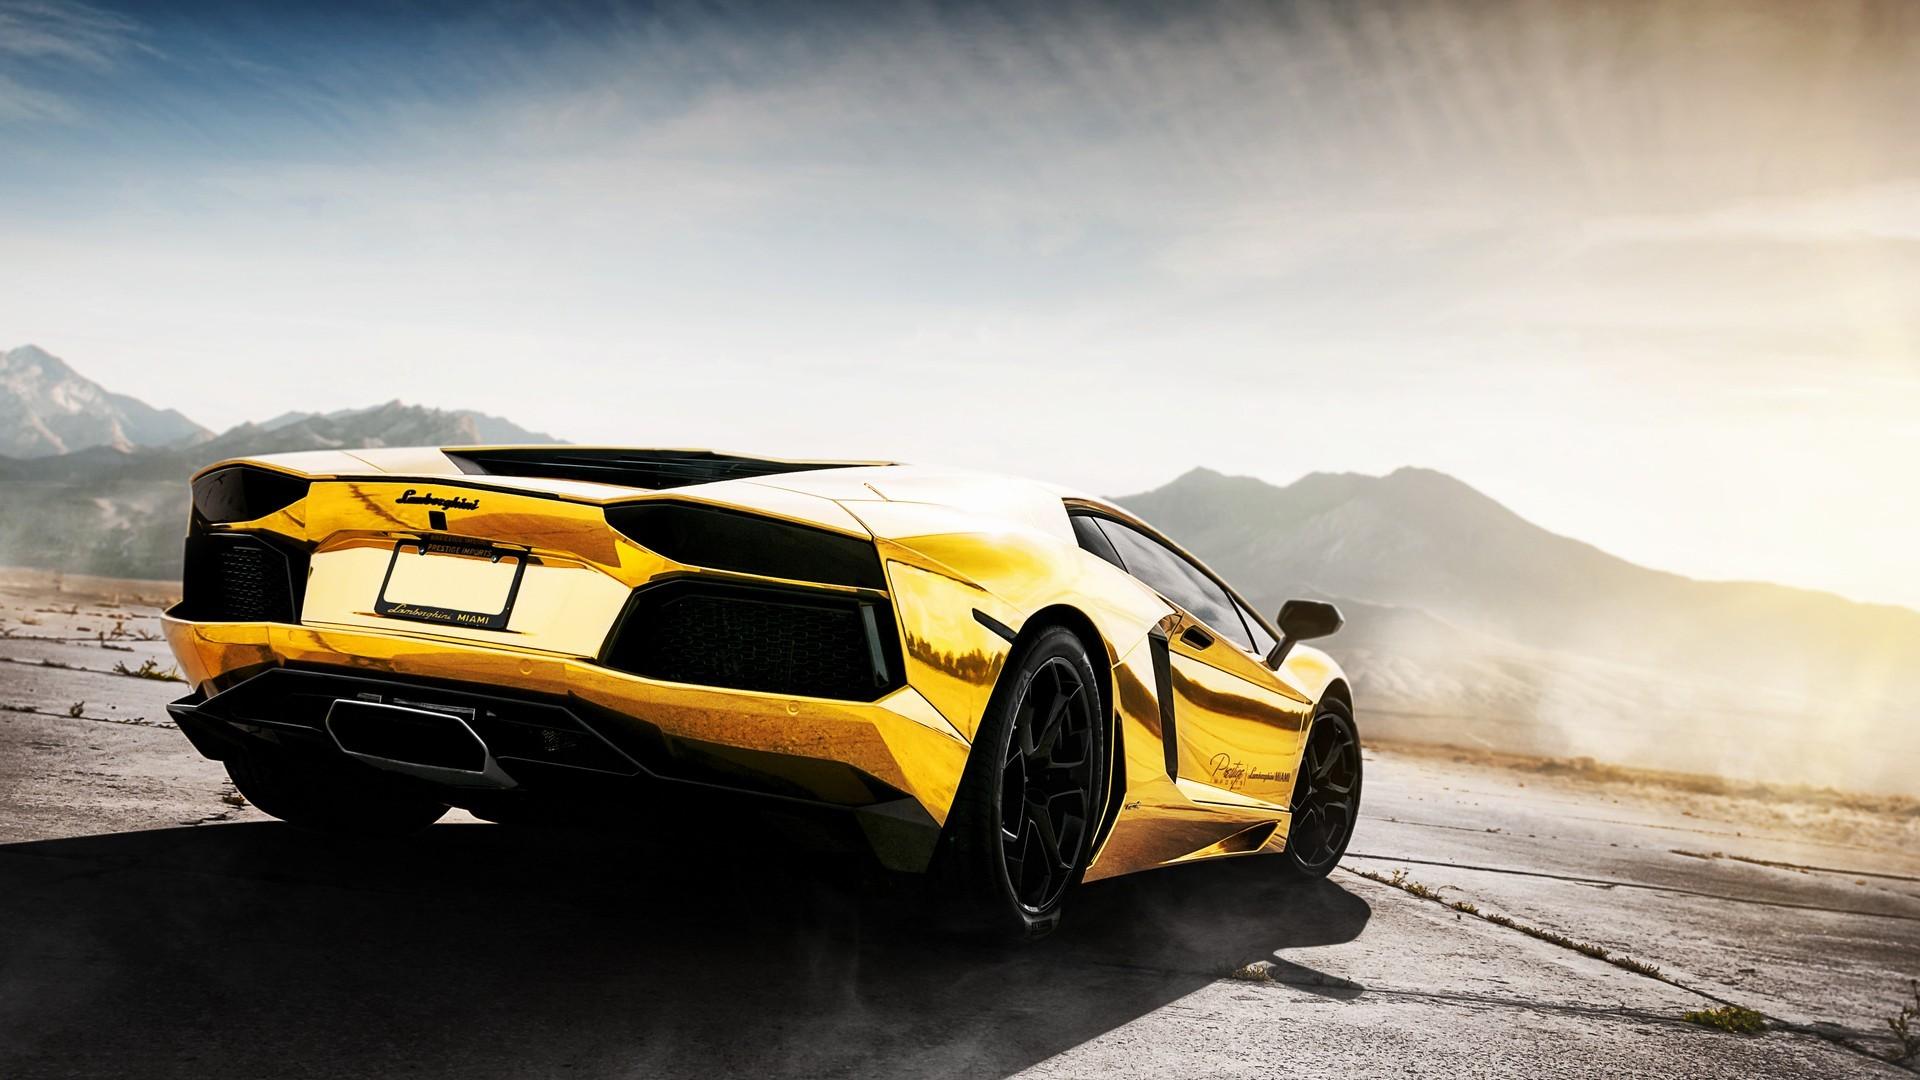 Wallpaper 1920x1080 Px Car Gold Lamborghini Rims Simple